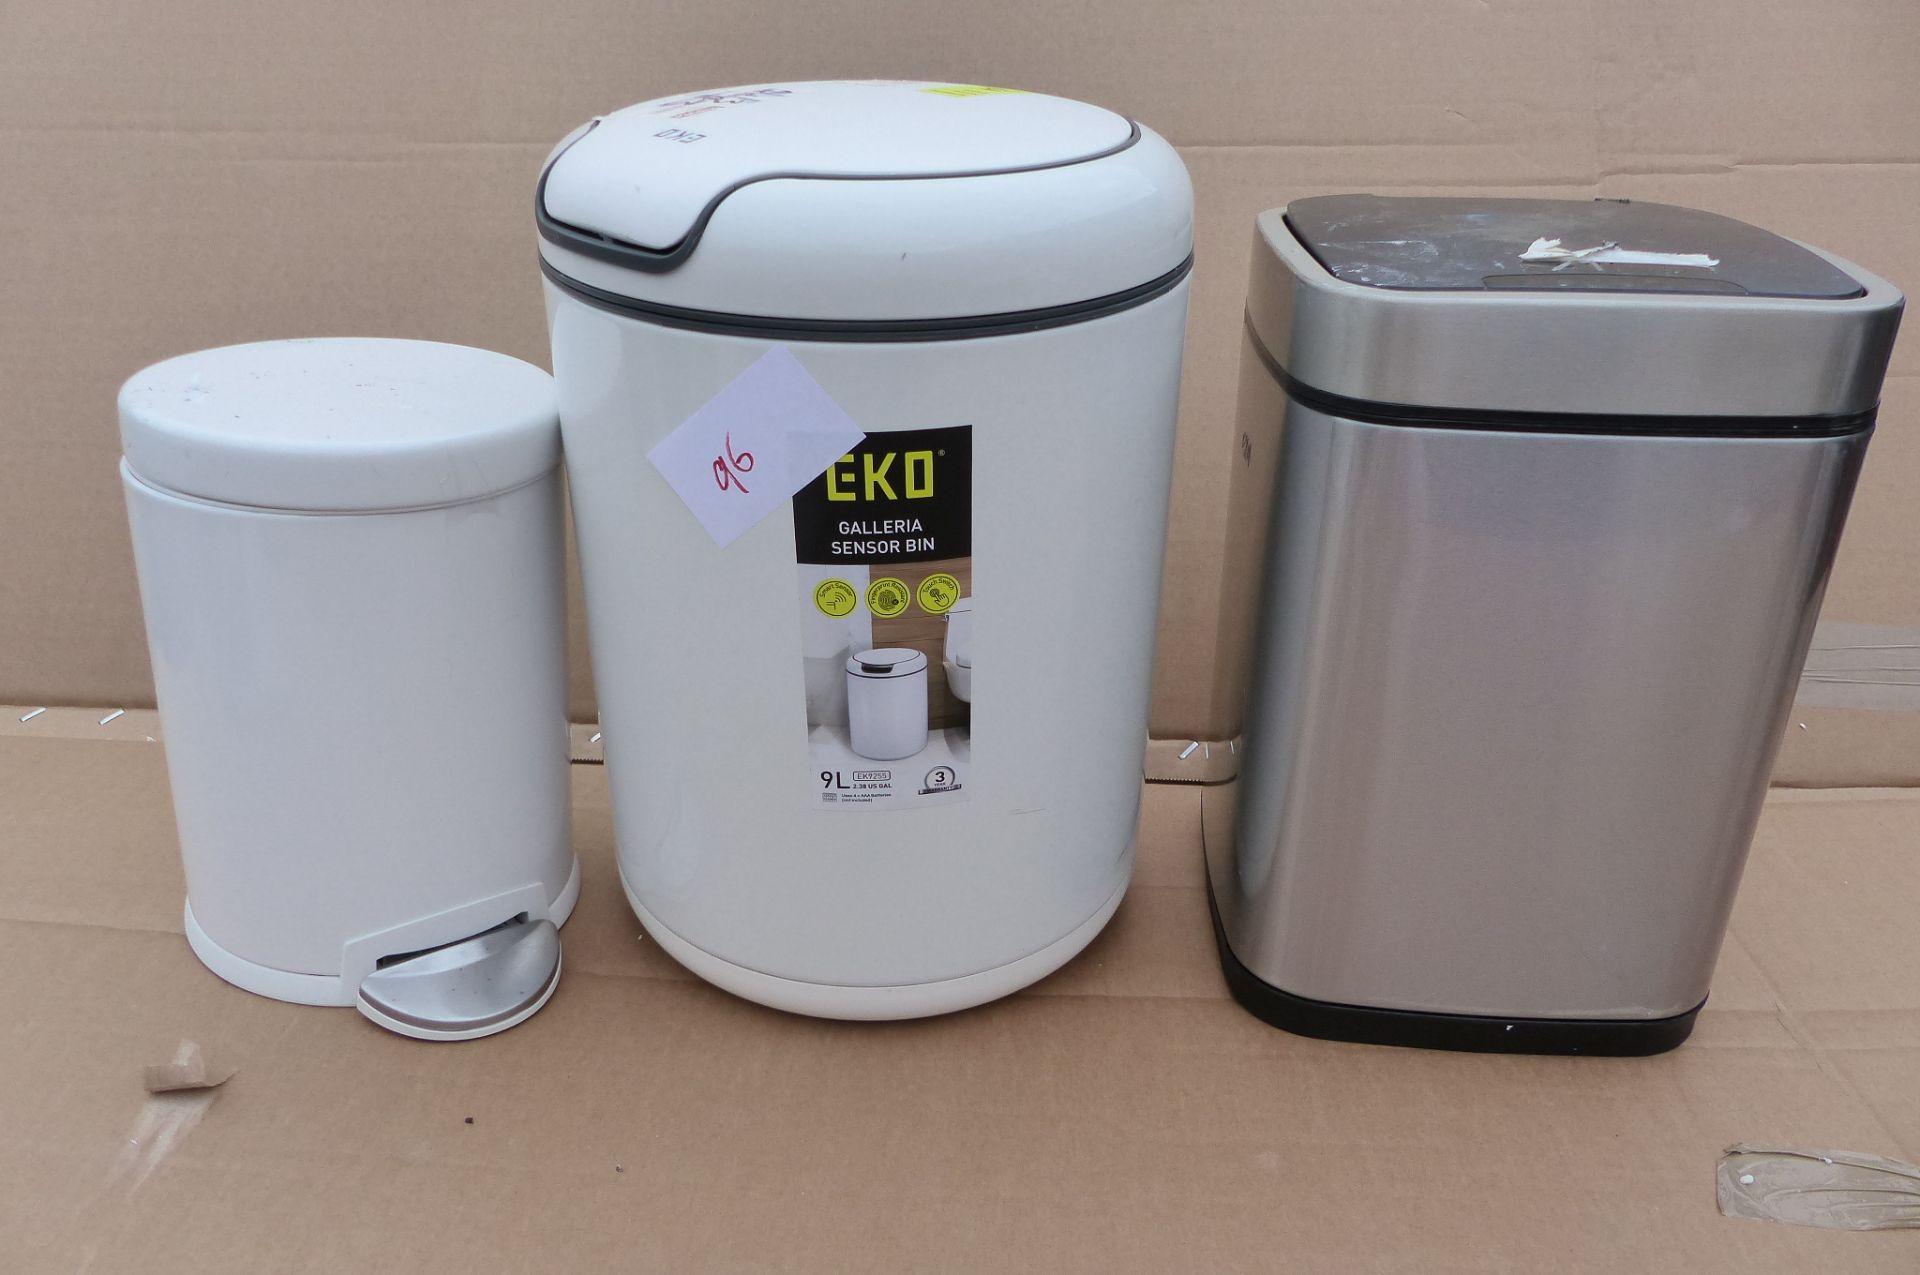 3 Waste bins to include EKO Sensor bin